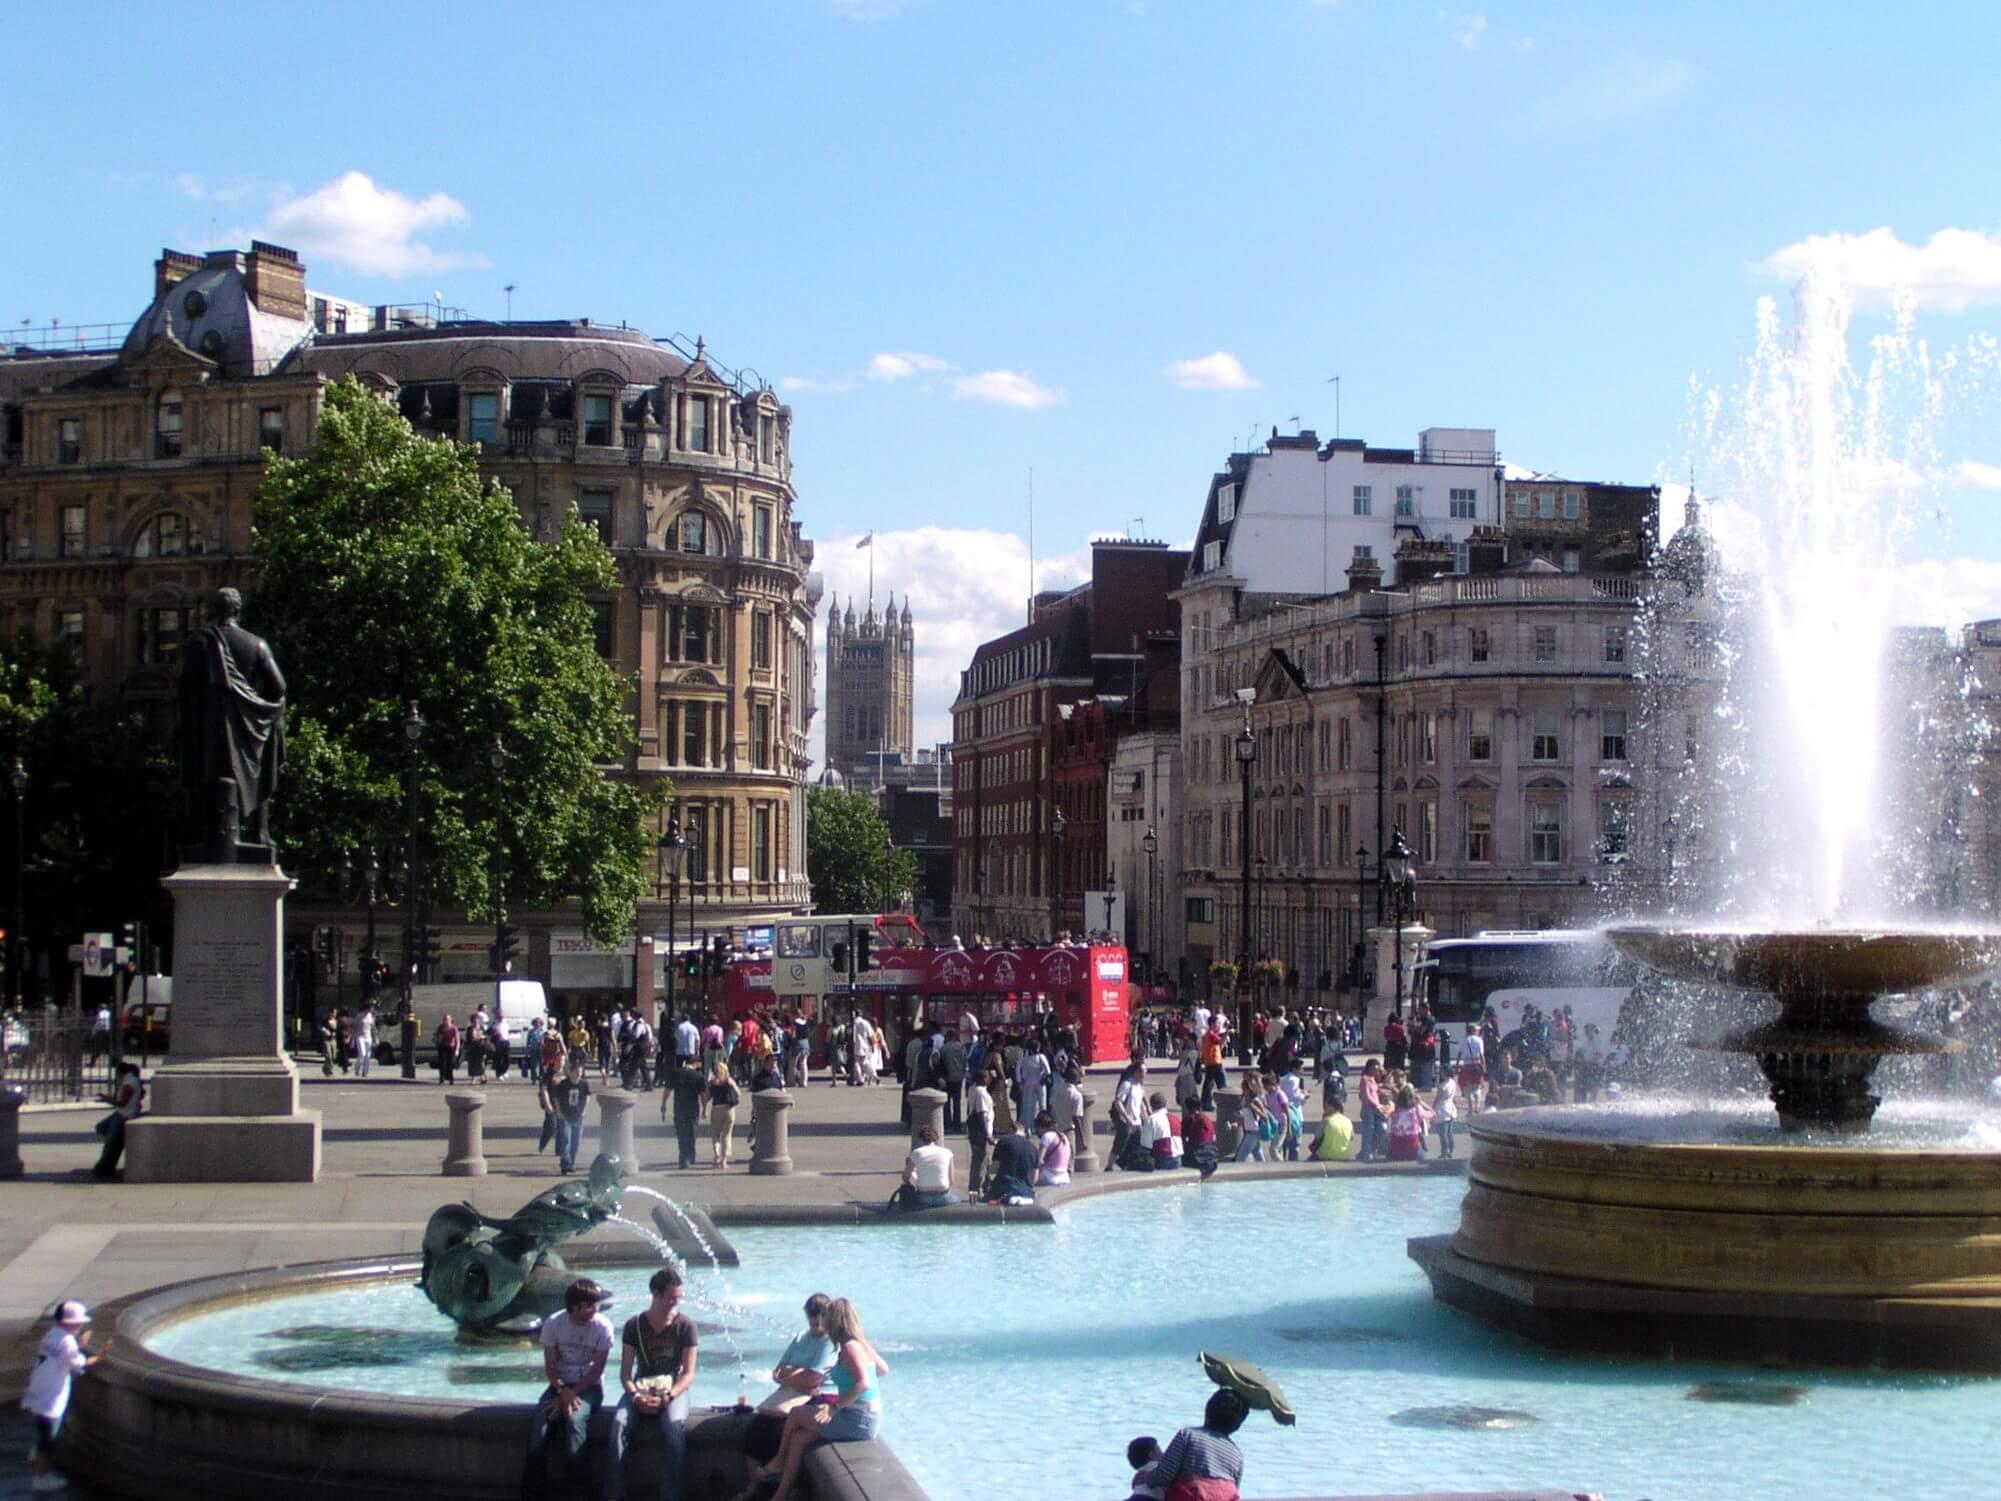 London (c) Lomoherz